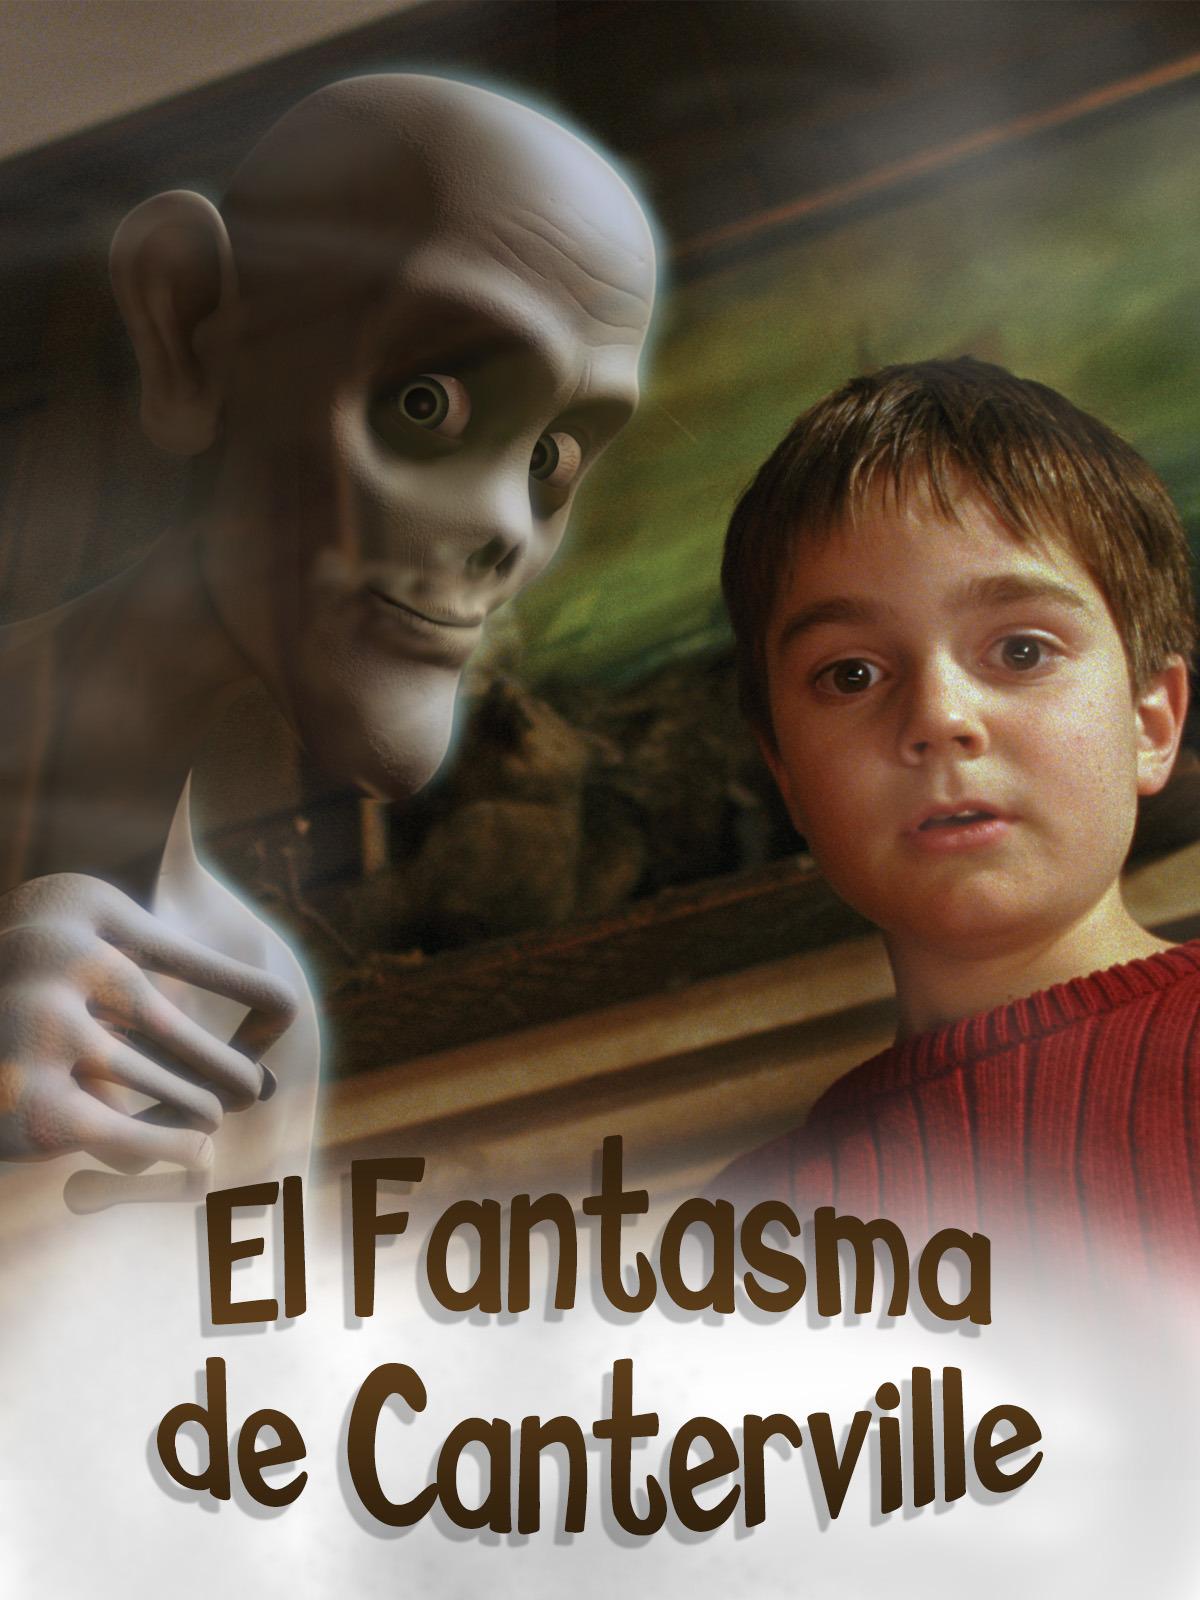 El fantasma de Canterville (2005)